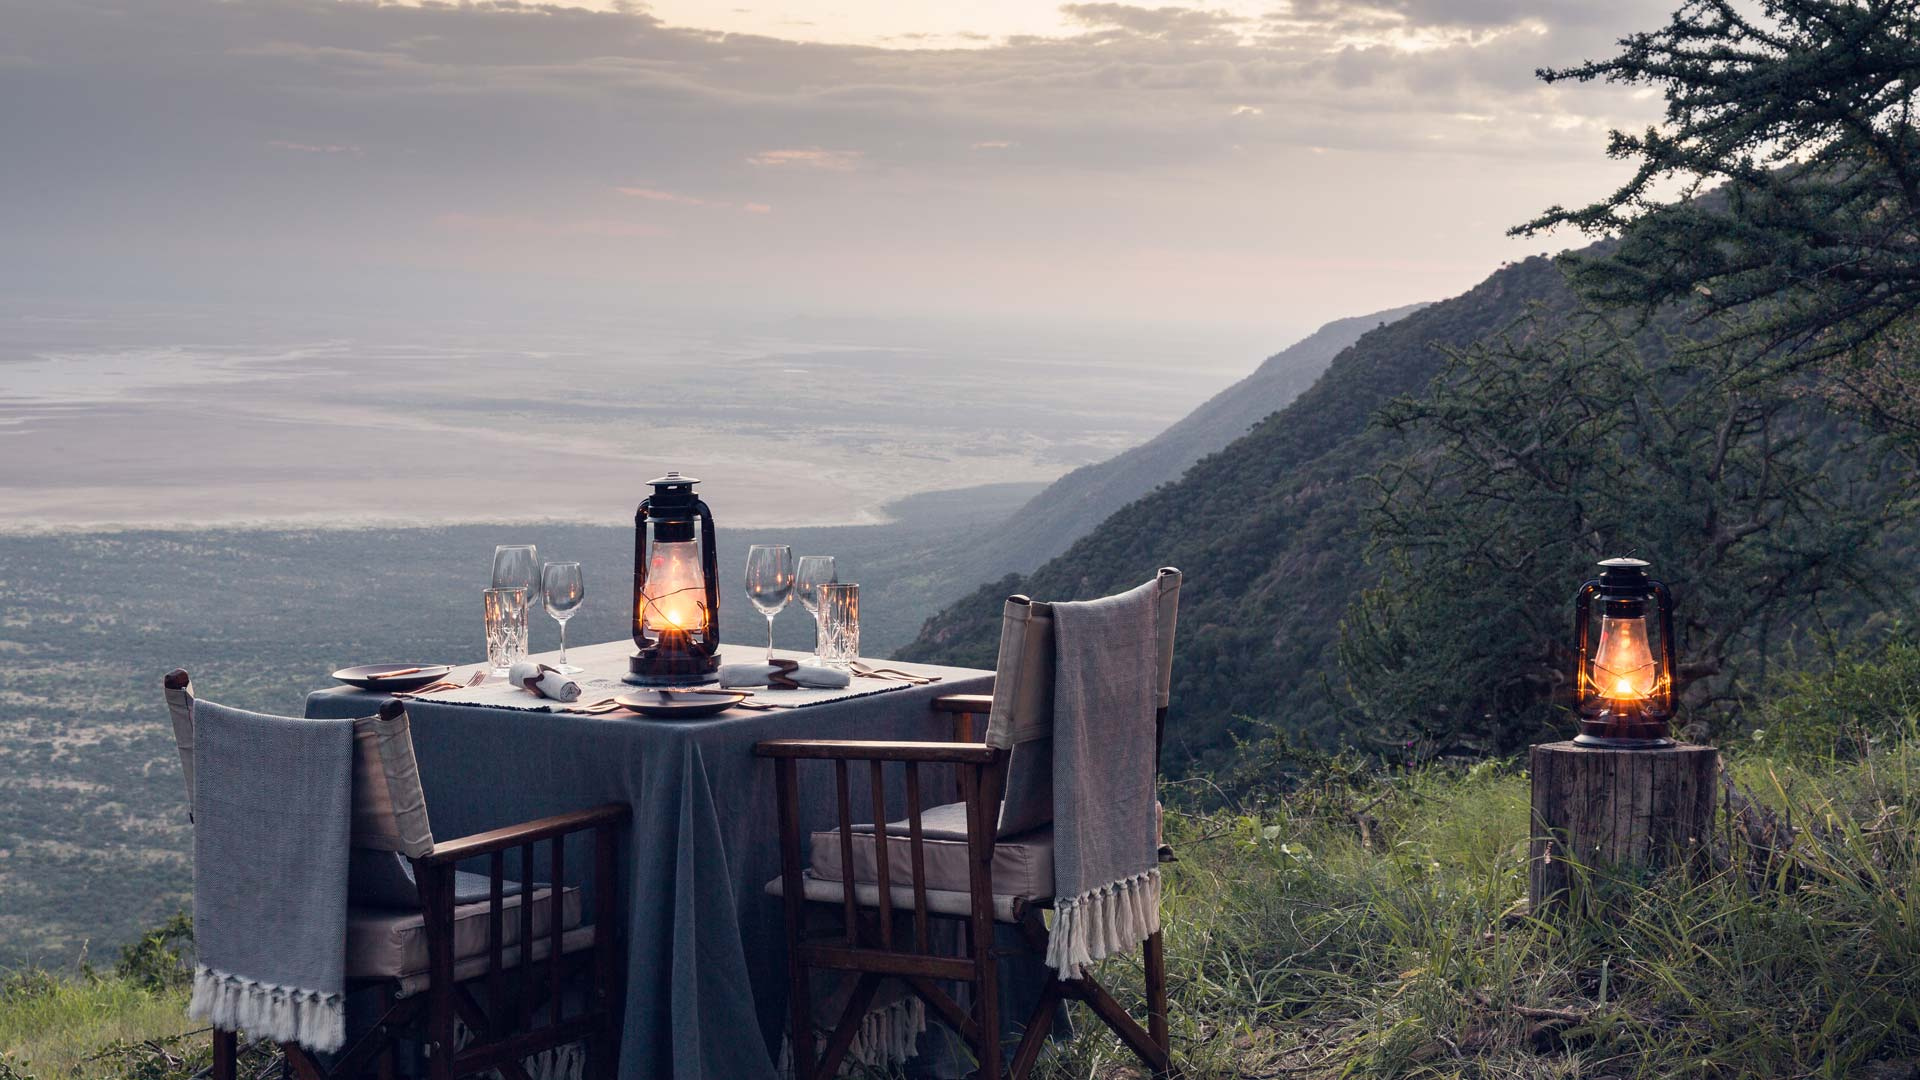 Dinner with view to Lake Eyasi